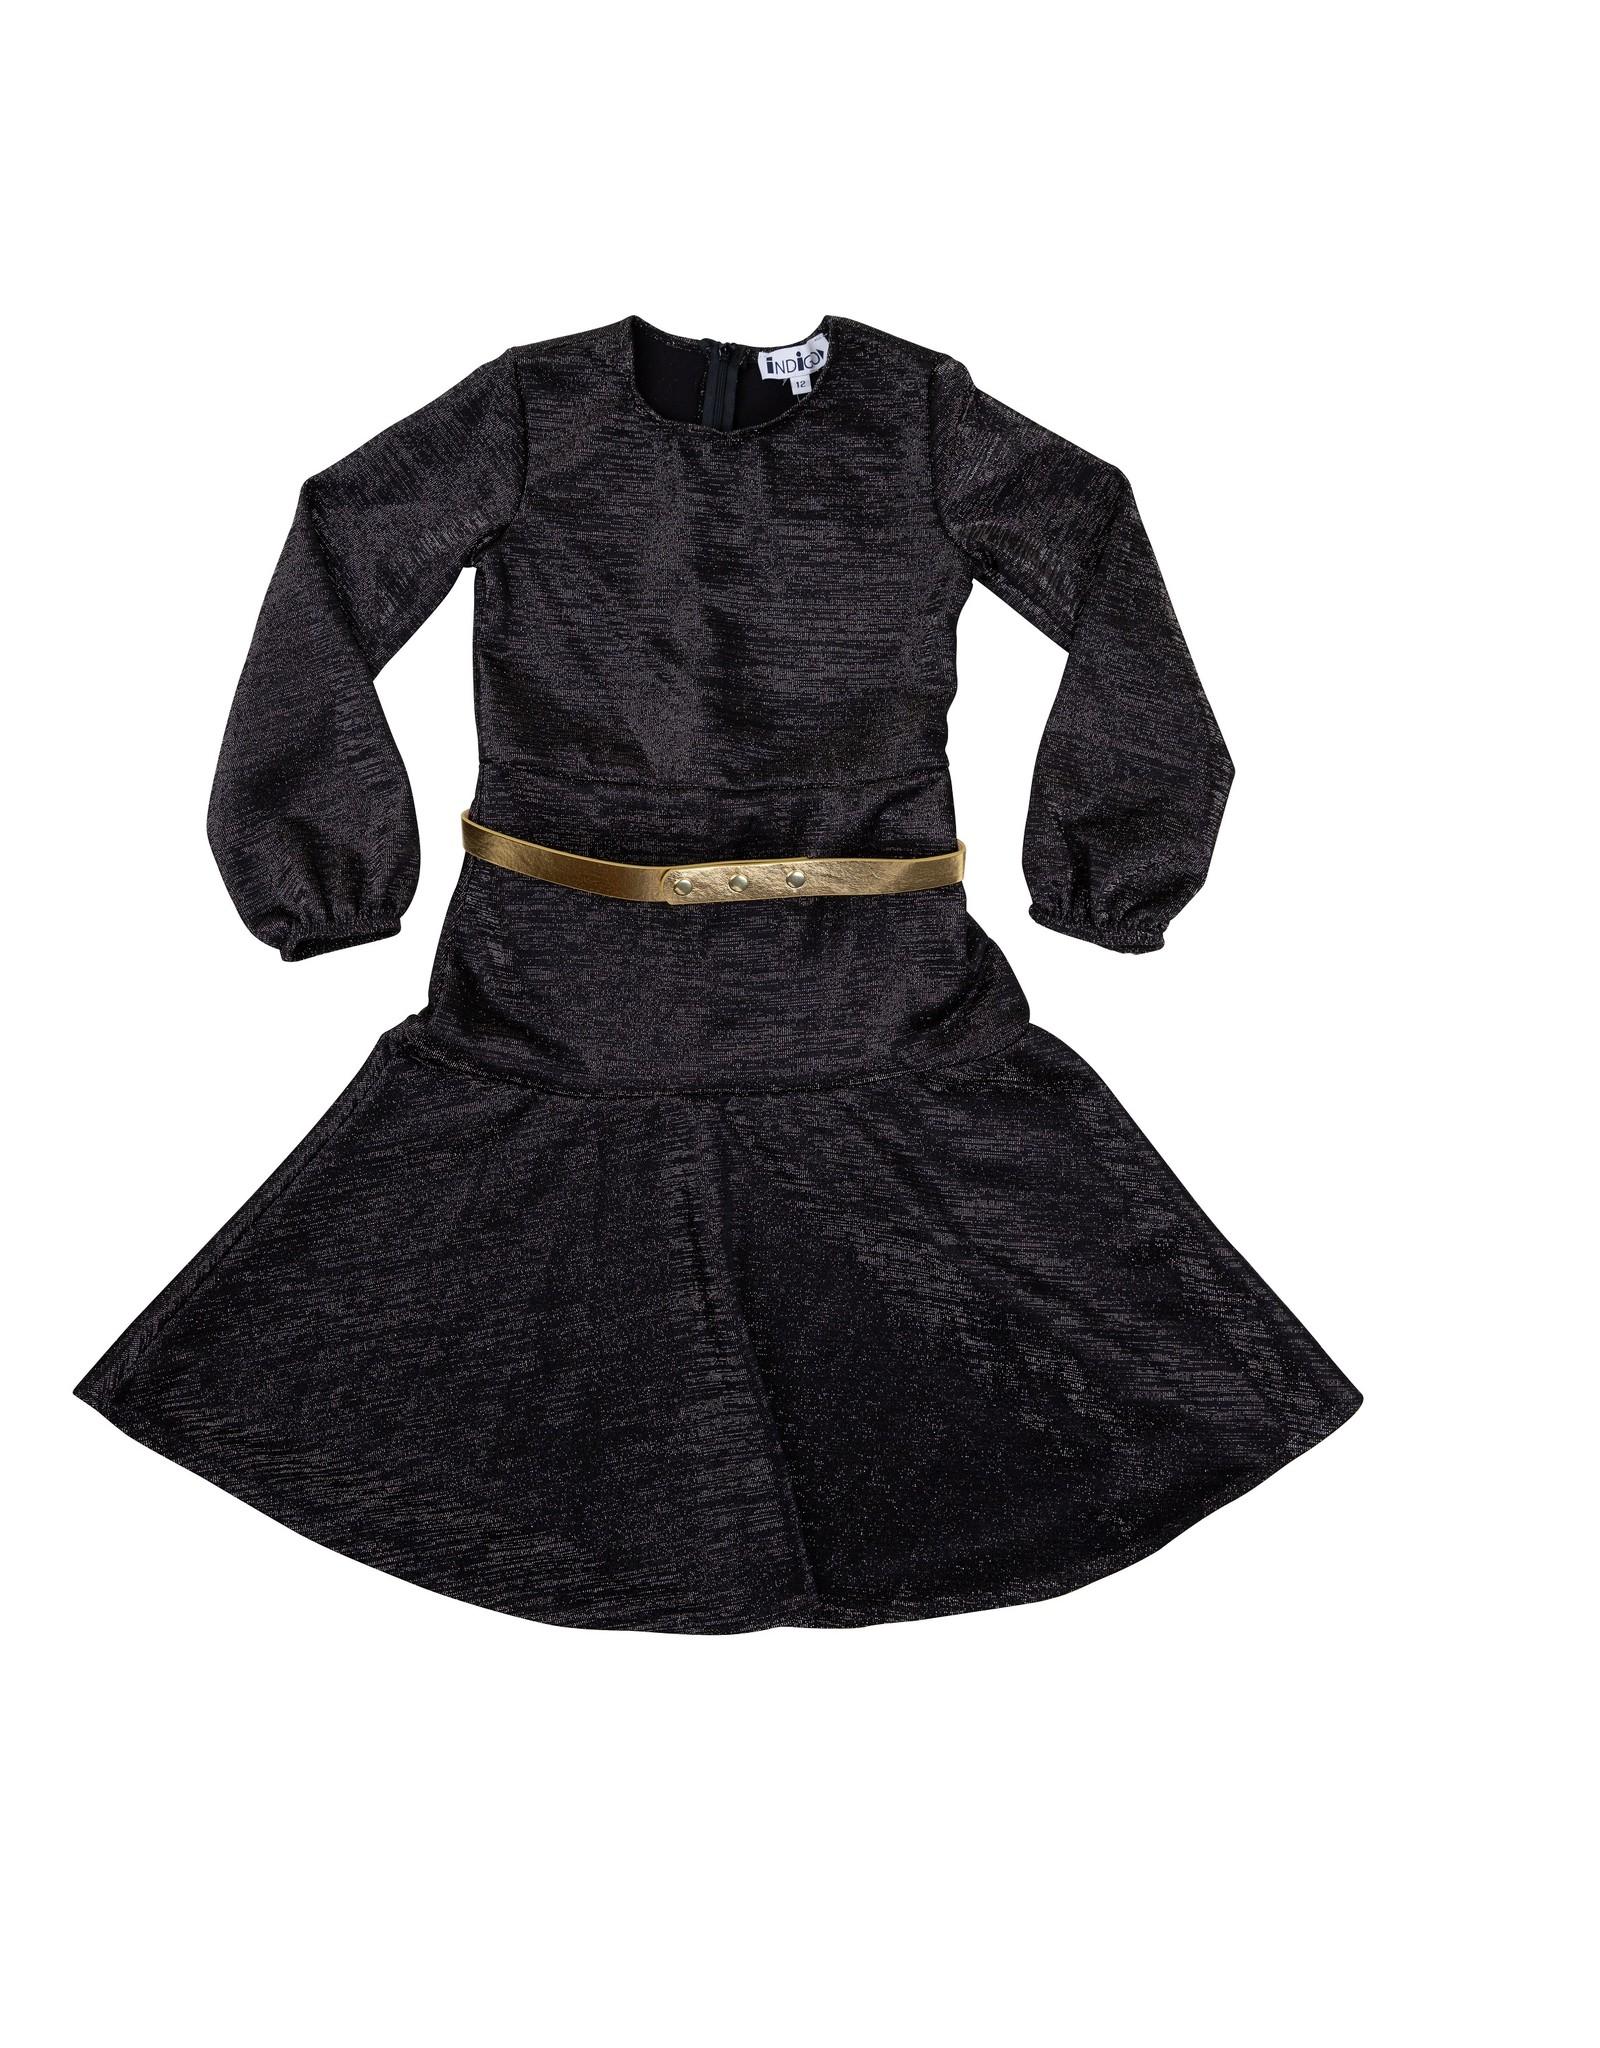 Indigo Indigo Metallic Fit and Flare Dress